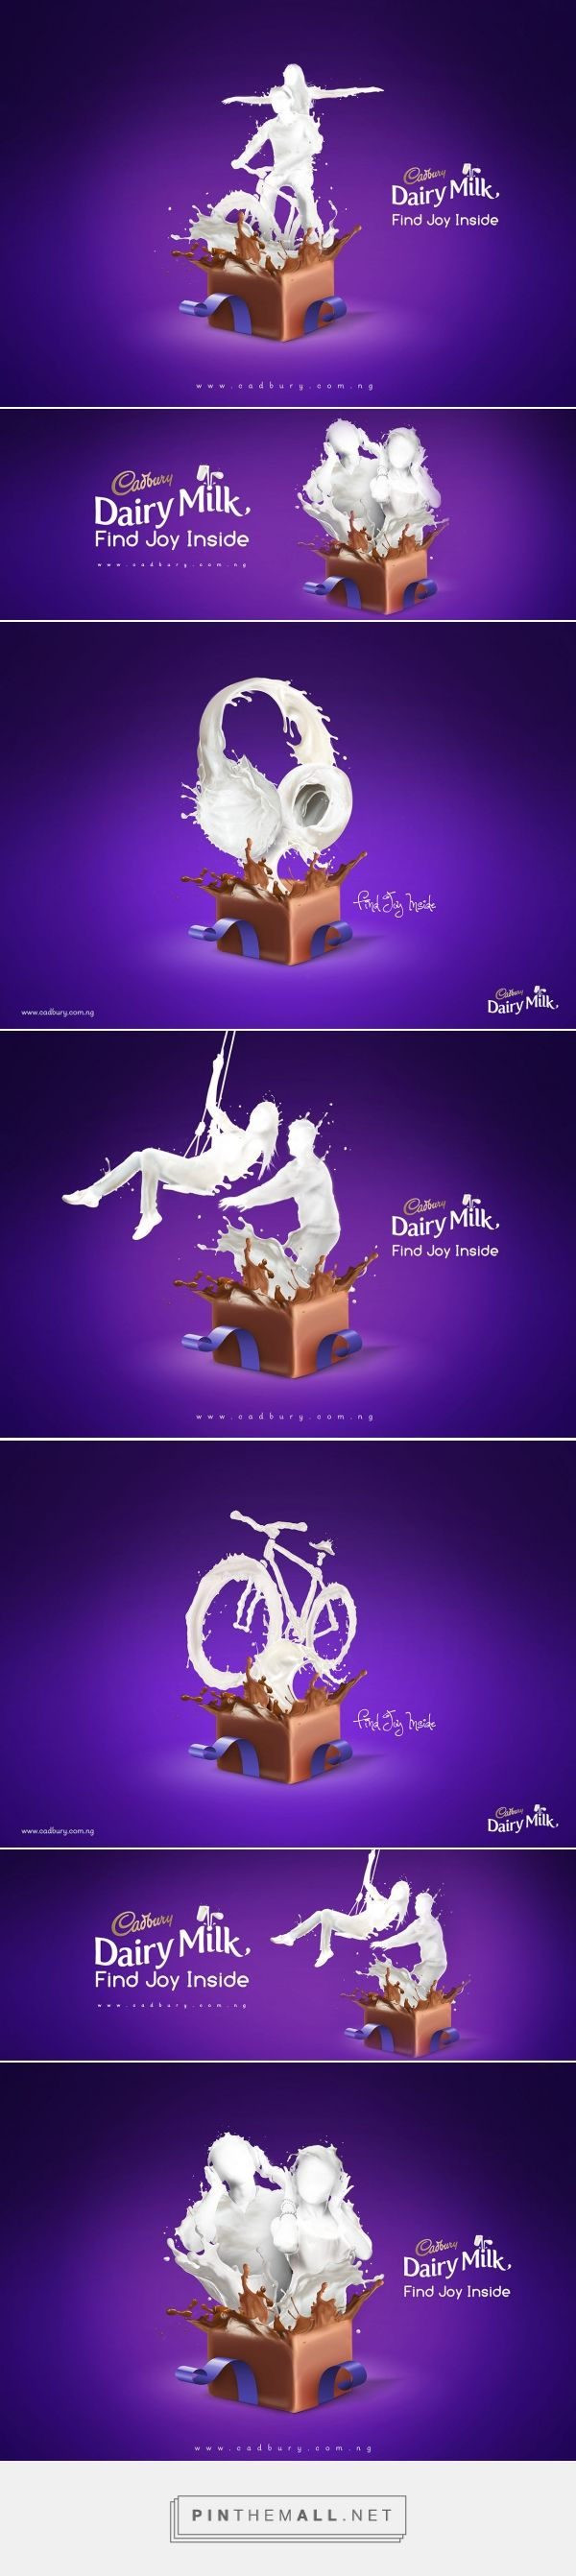 MILK AND CHOCOLATE A Cadbury Ad Proposal By Ernicio Omaggi